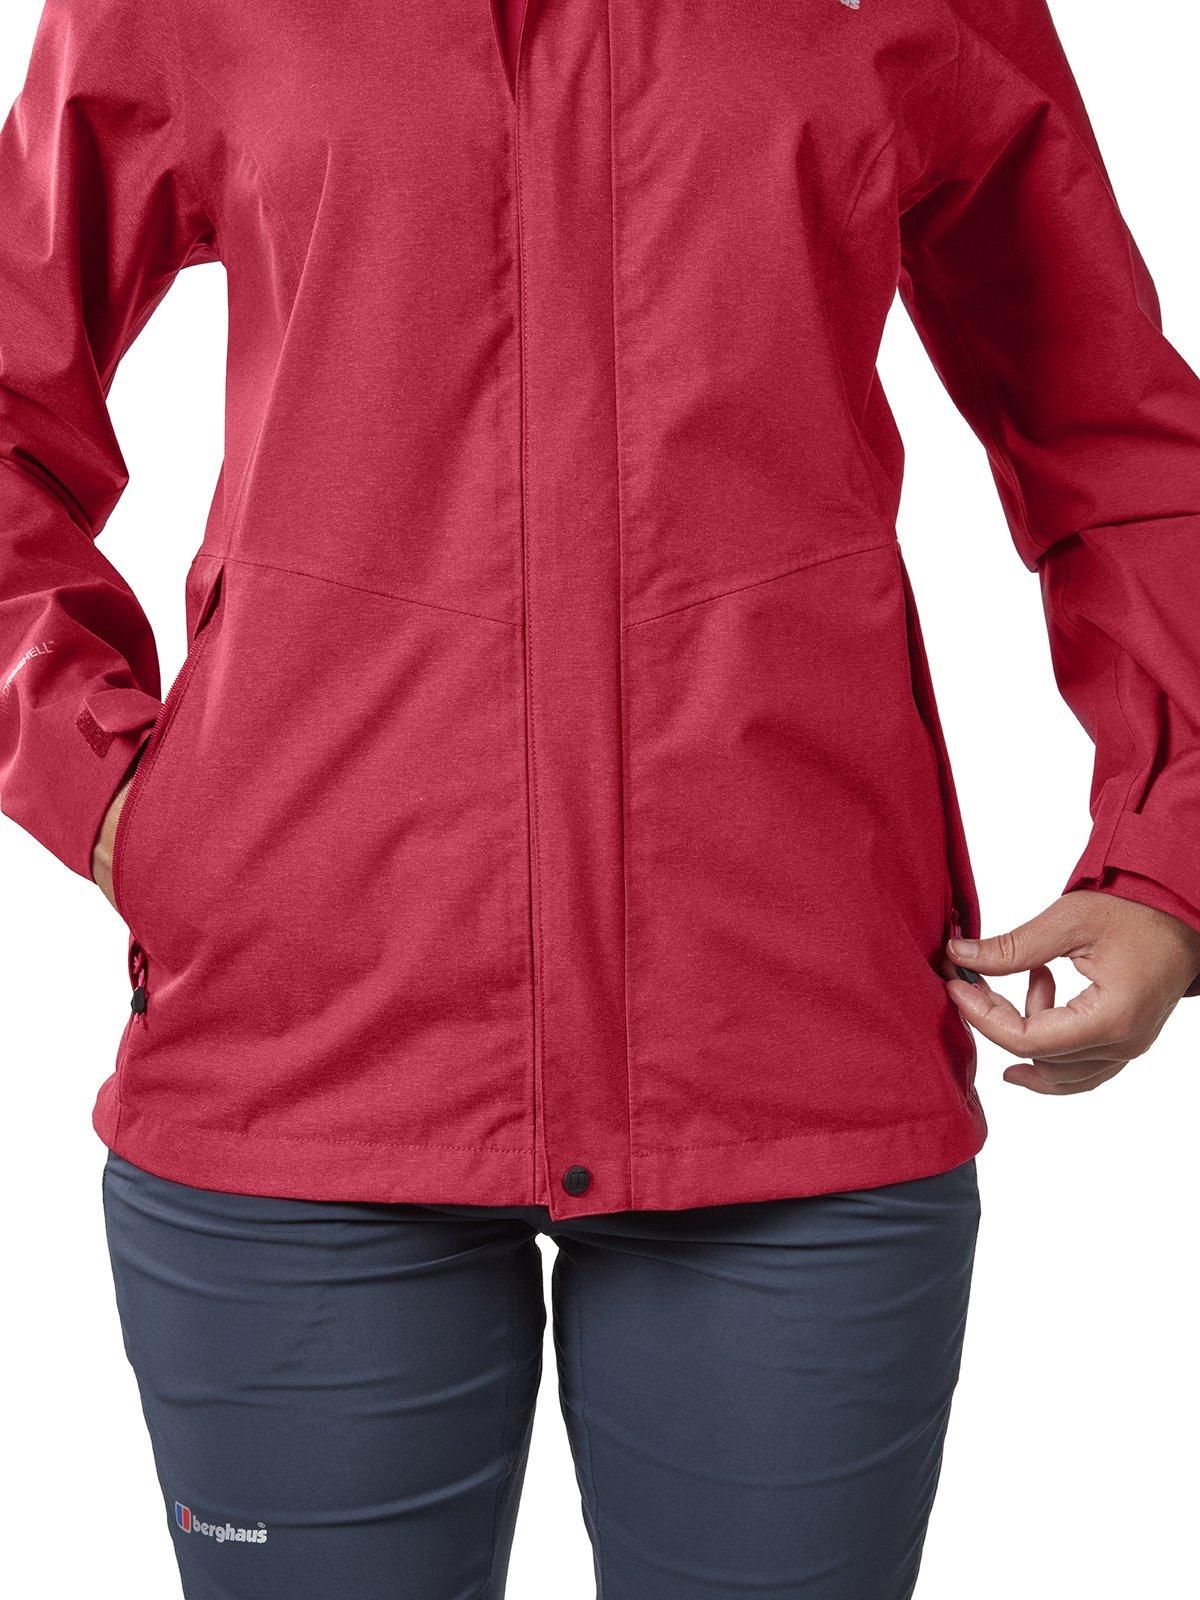 81TyliwRF5L - Berghaus Women's Elara Waterproof Jacket